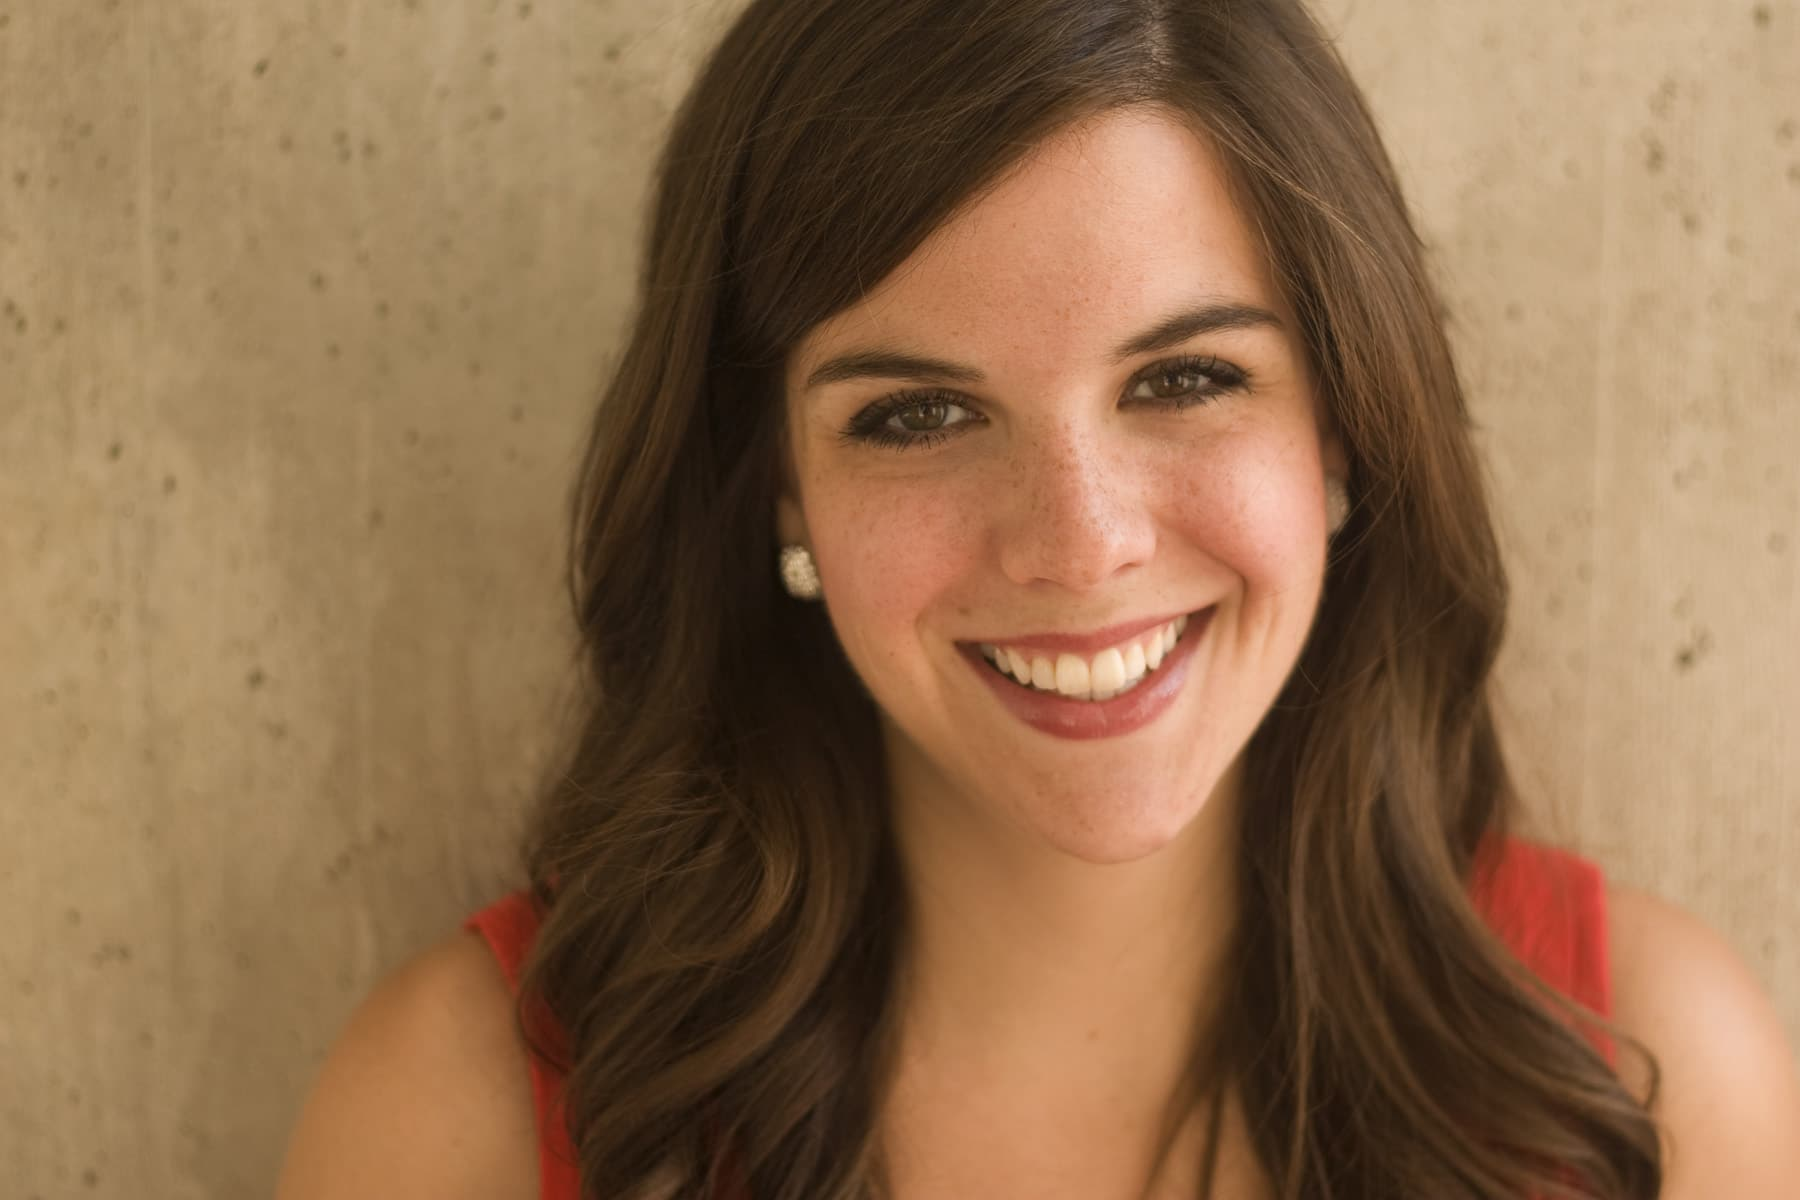 Ep. 1: Abby Krawson